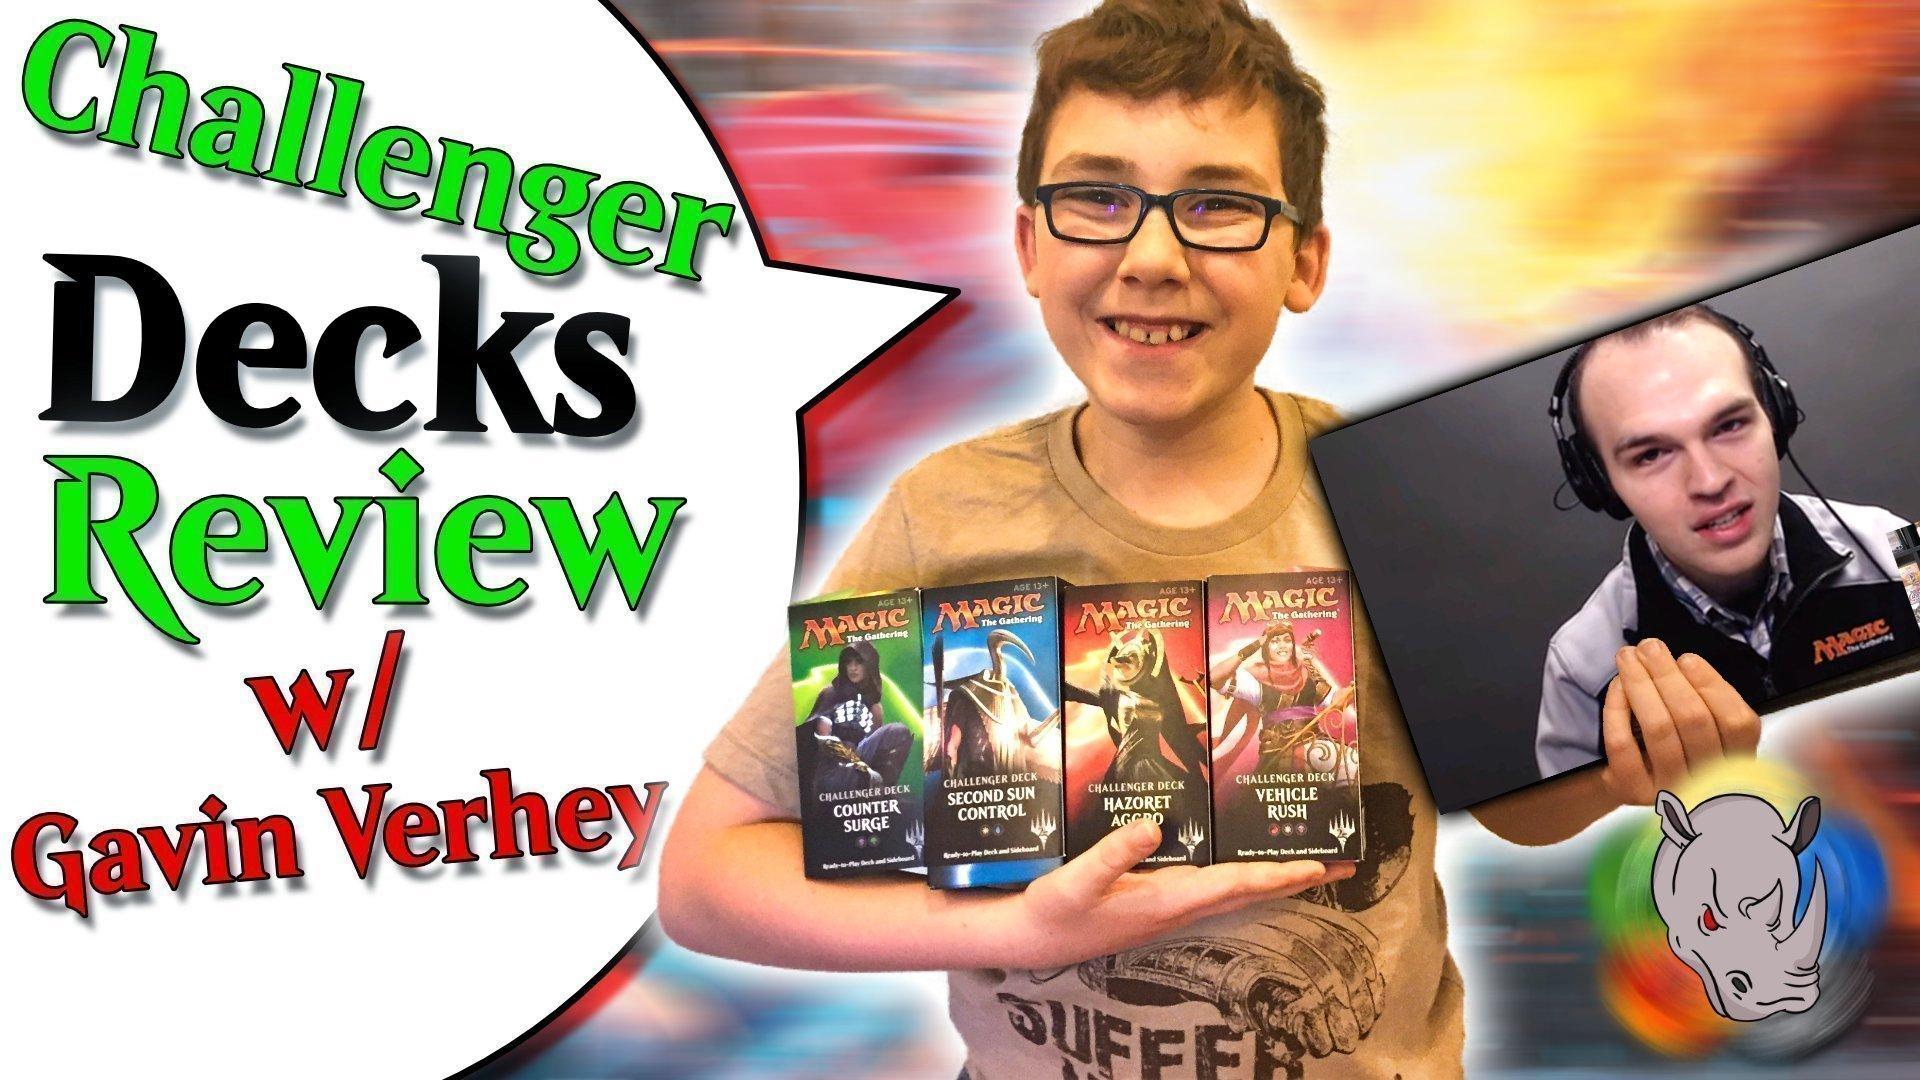 Challenger Decks Review with Gavin Verhey